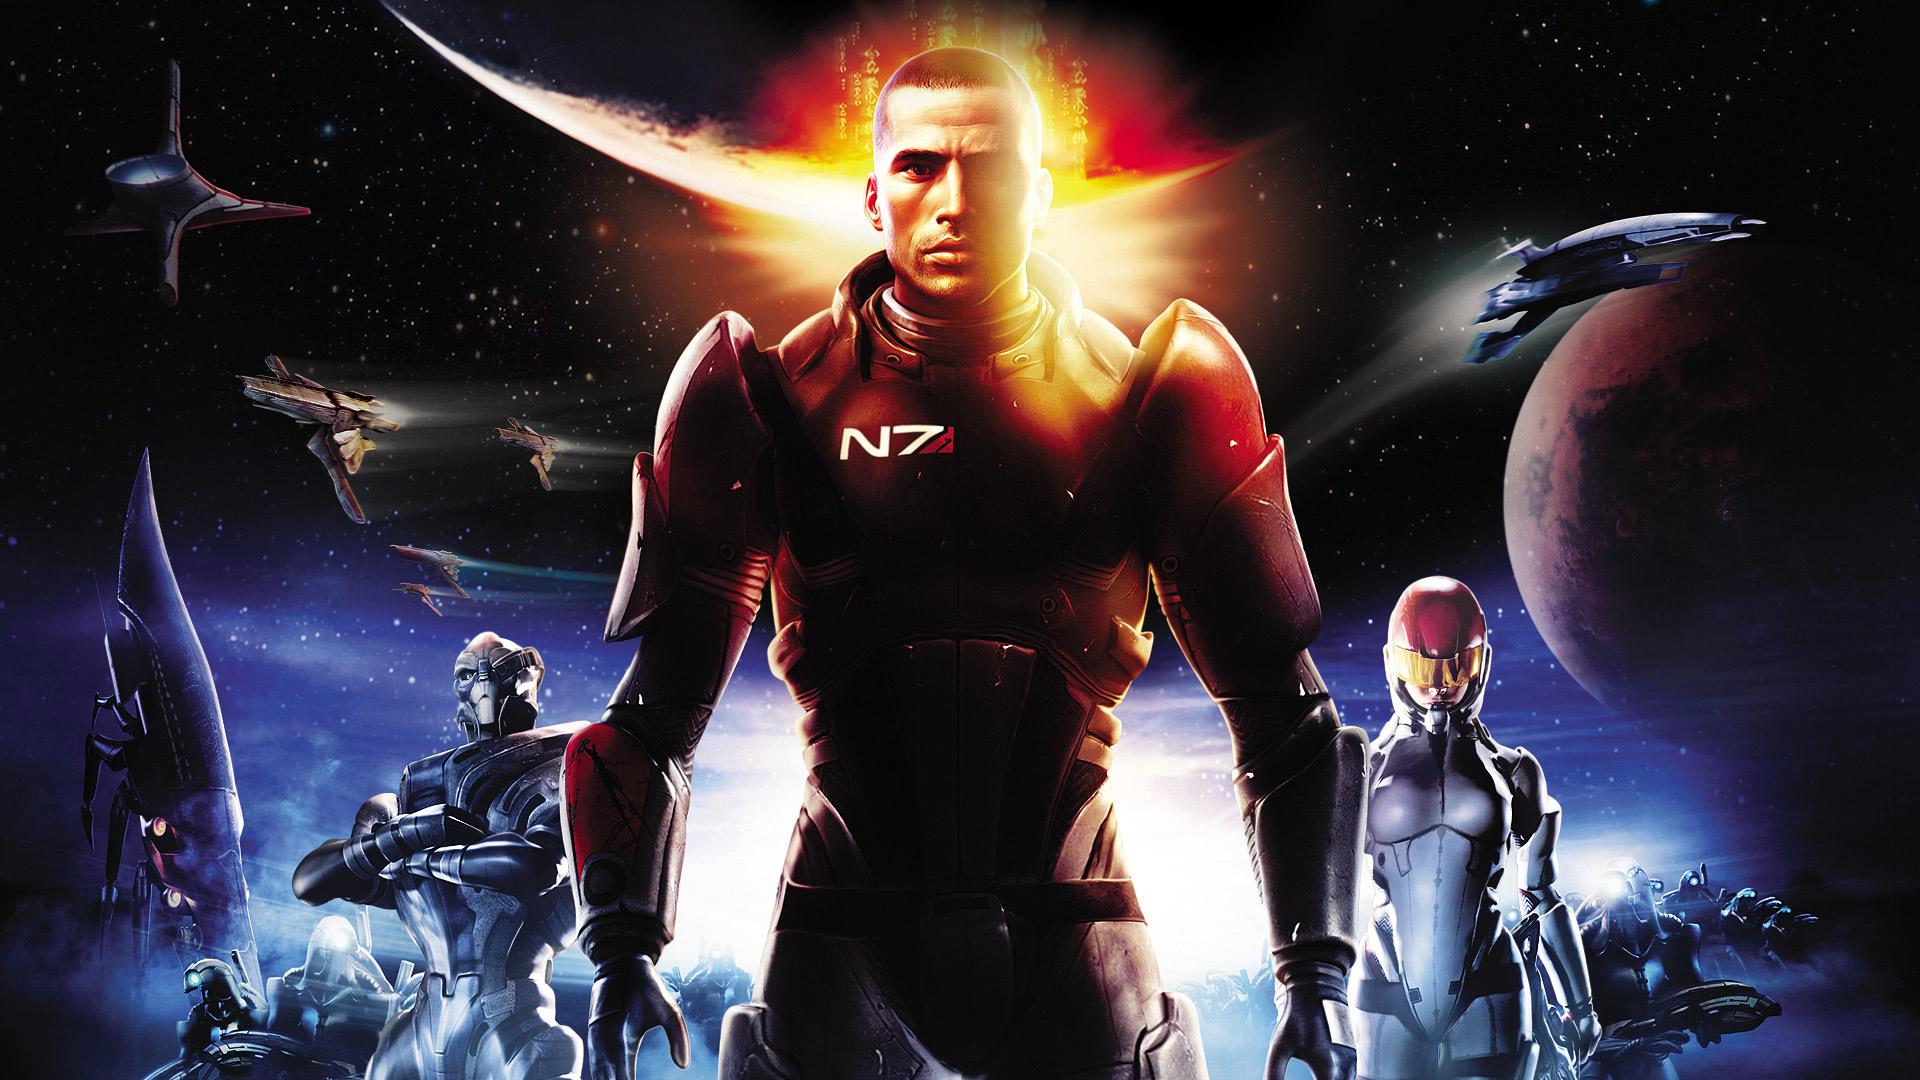 Mass Effect HD Wallpaper | Background Image | 1920x1080 | ID:586278 -  Wallpaper Abyss